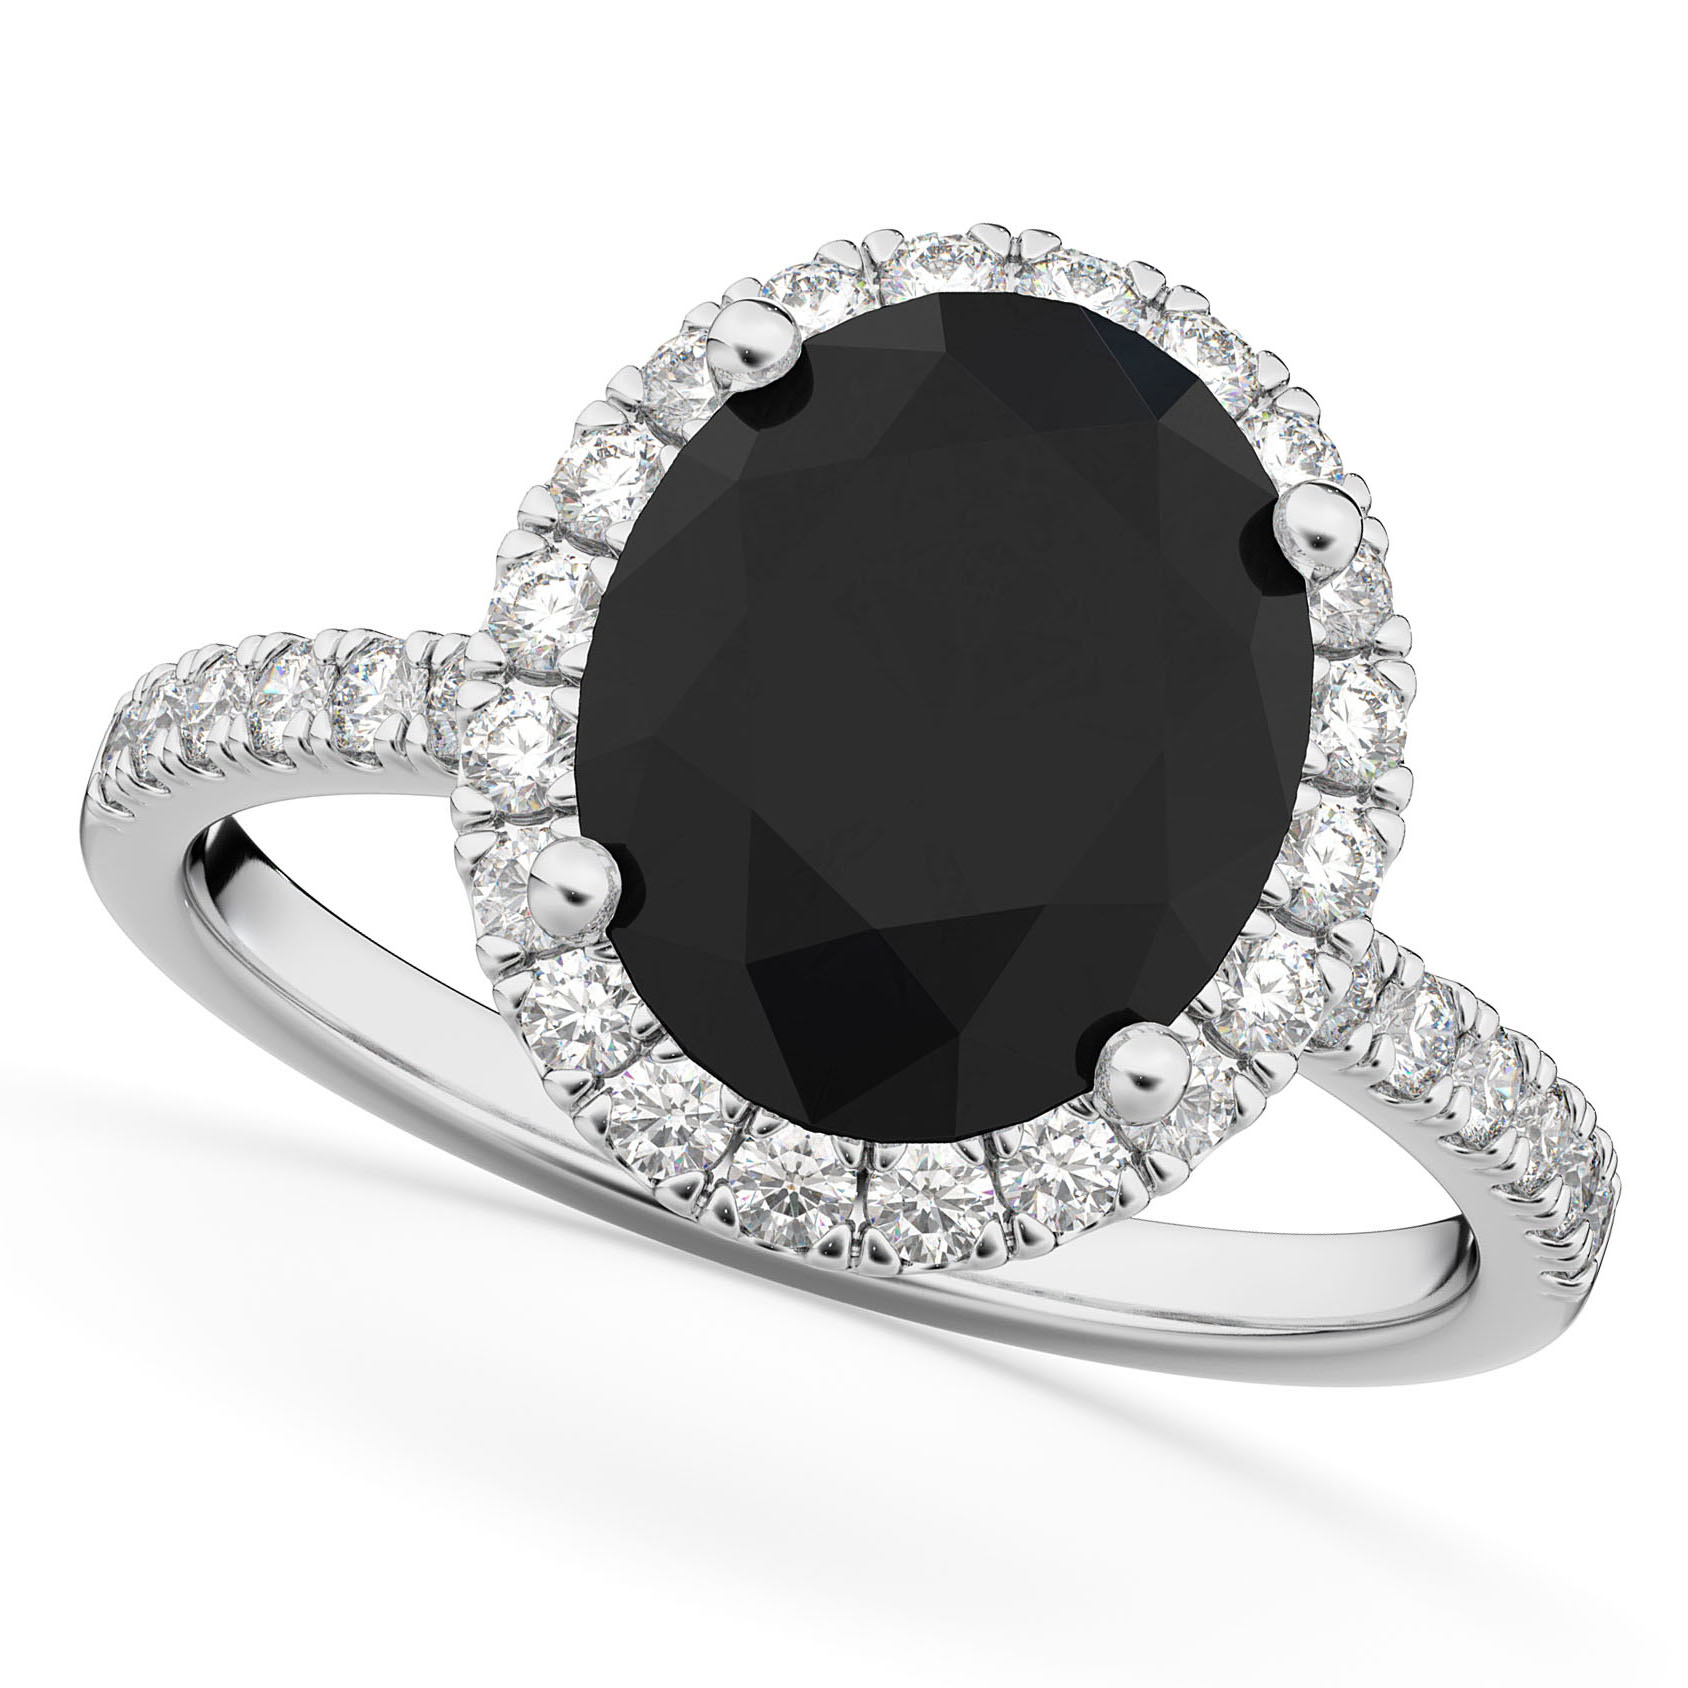 Oval Black Diamond & Diamond Engagement Ring 14K White Gold 3.51ct